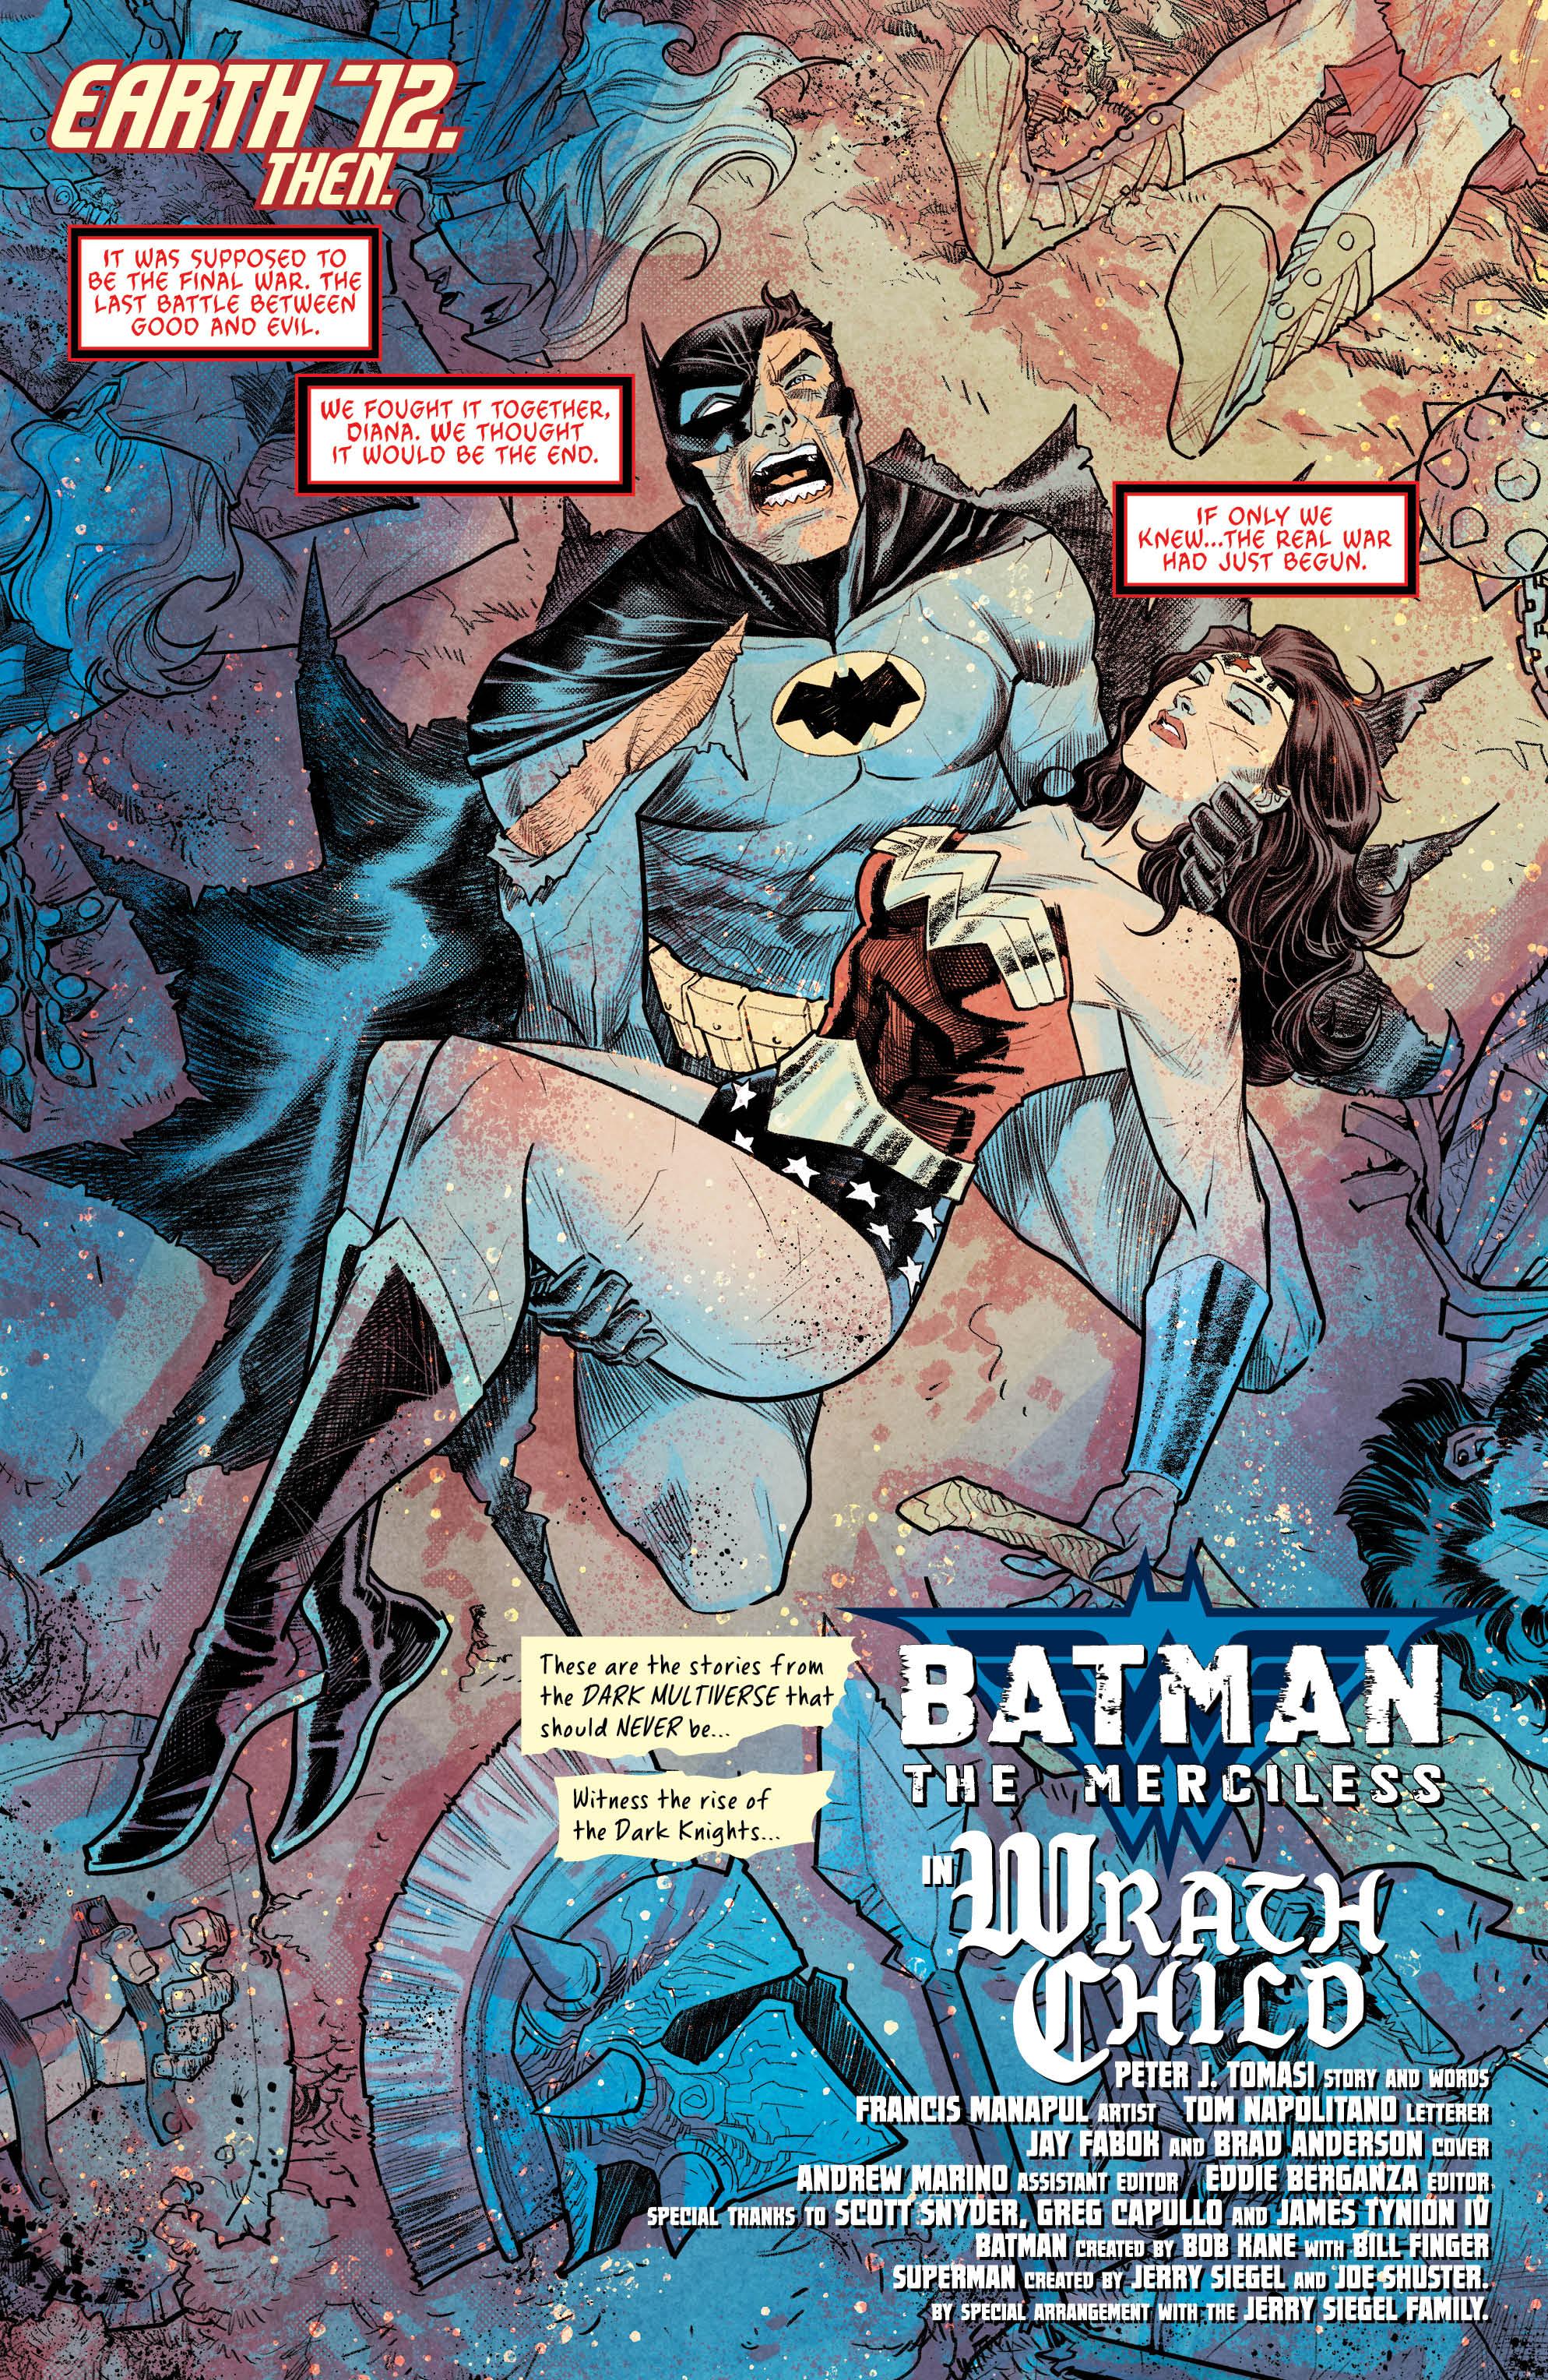 Batman The Merciless 1 - DC Comics News